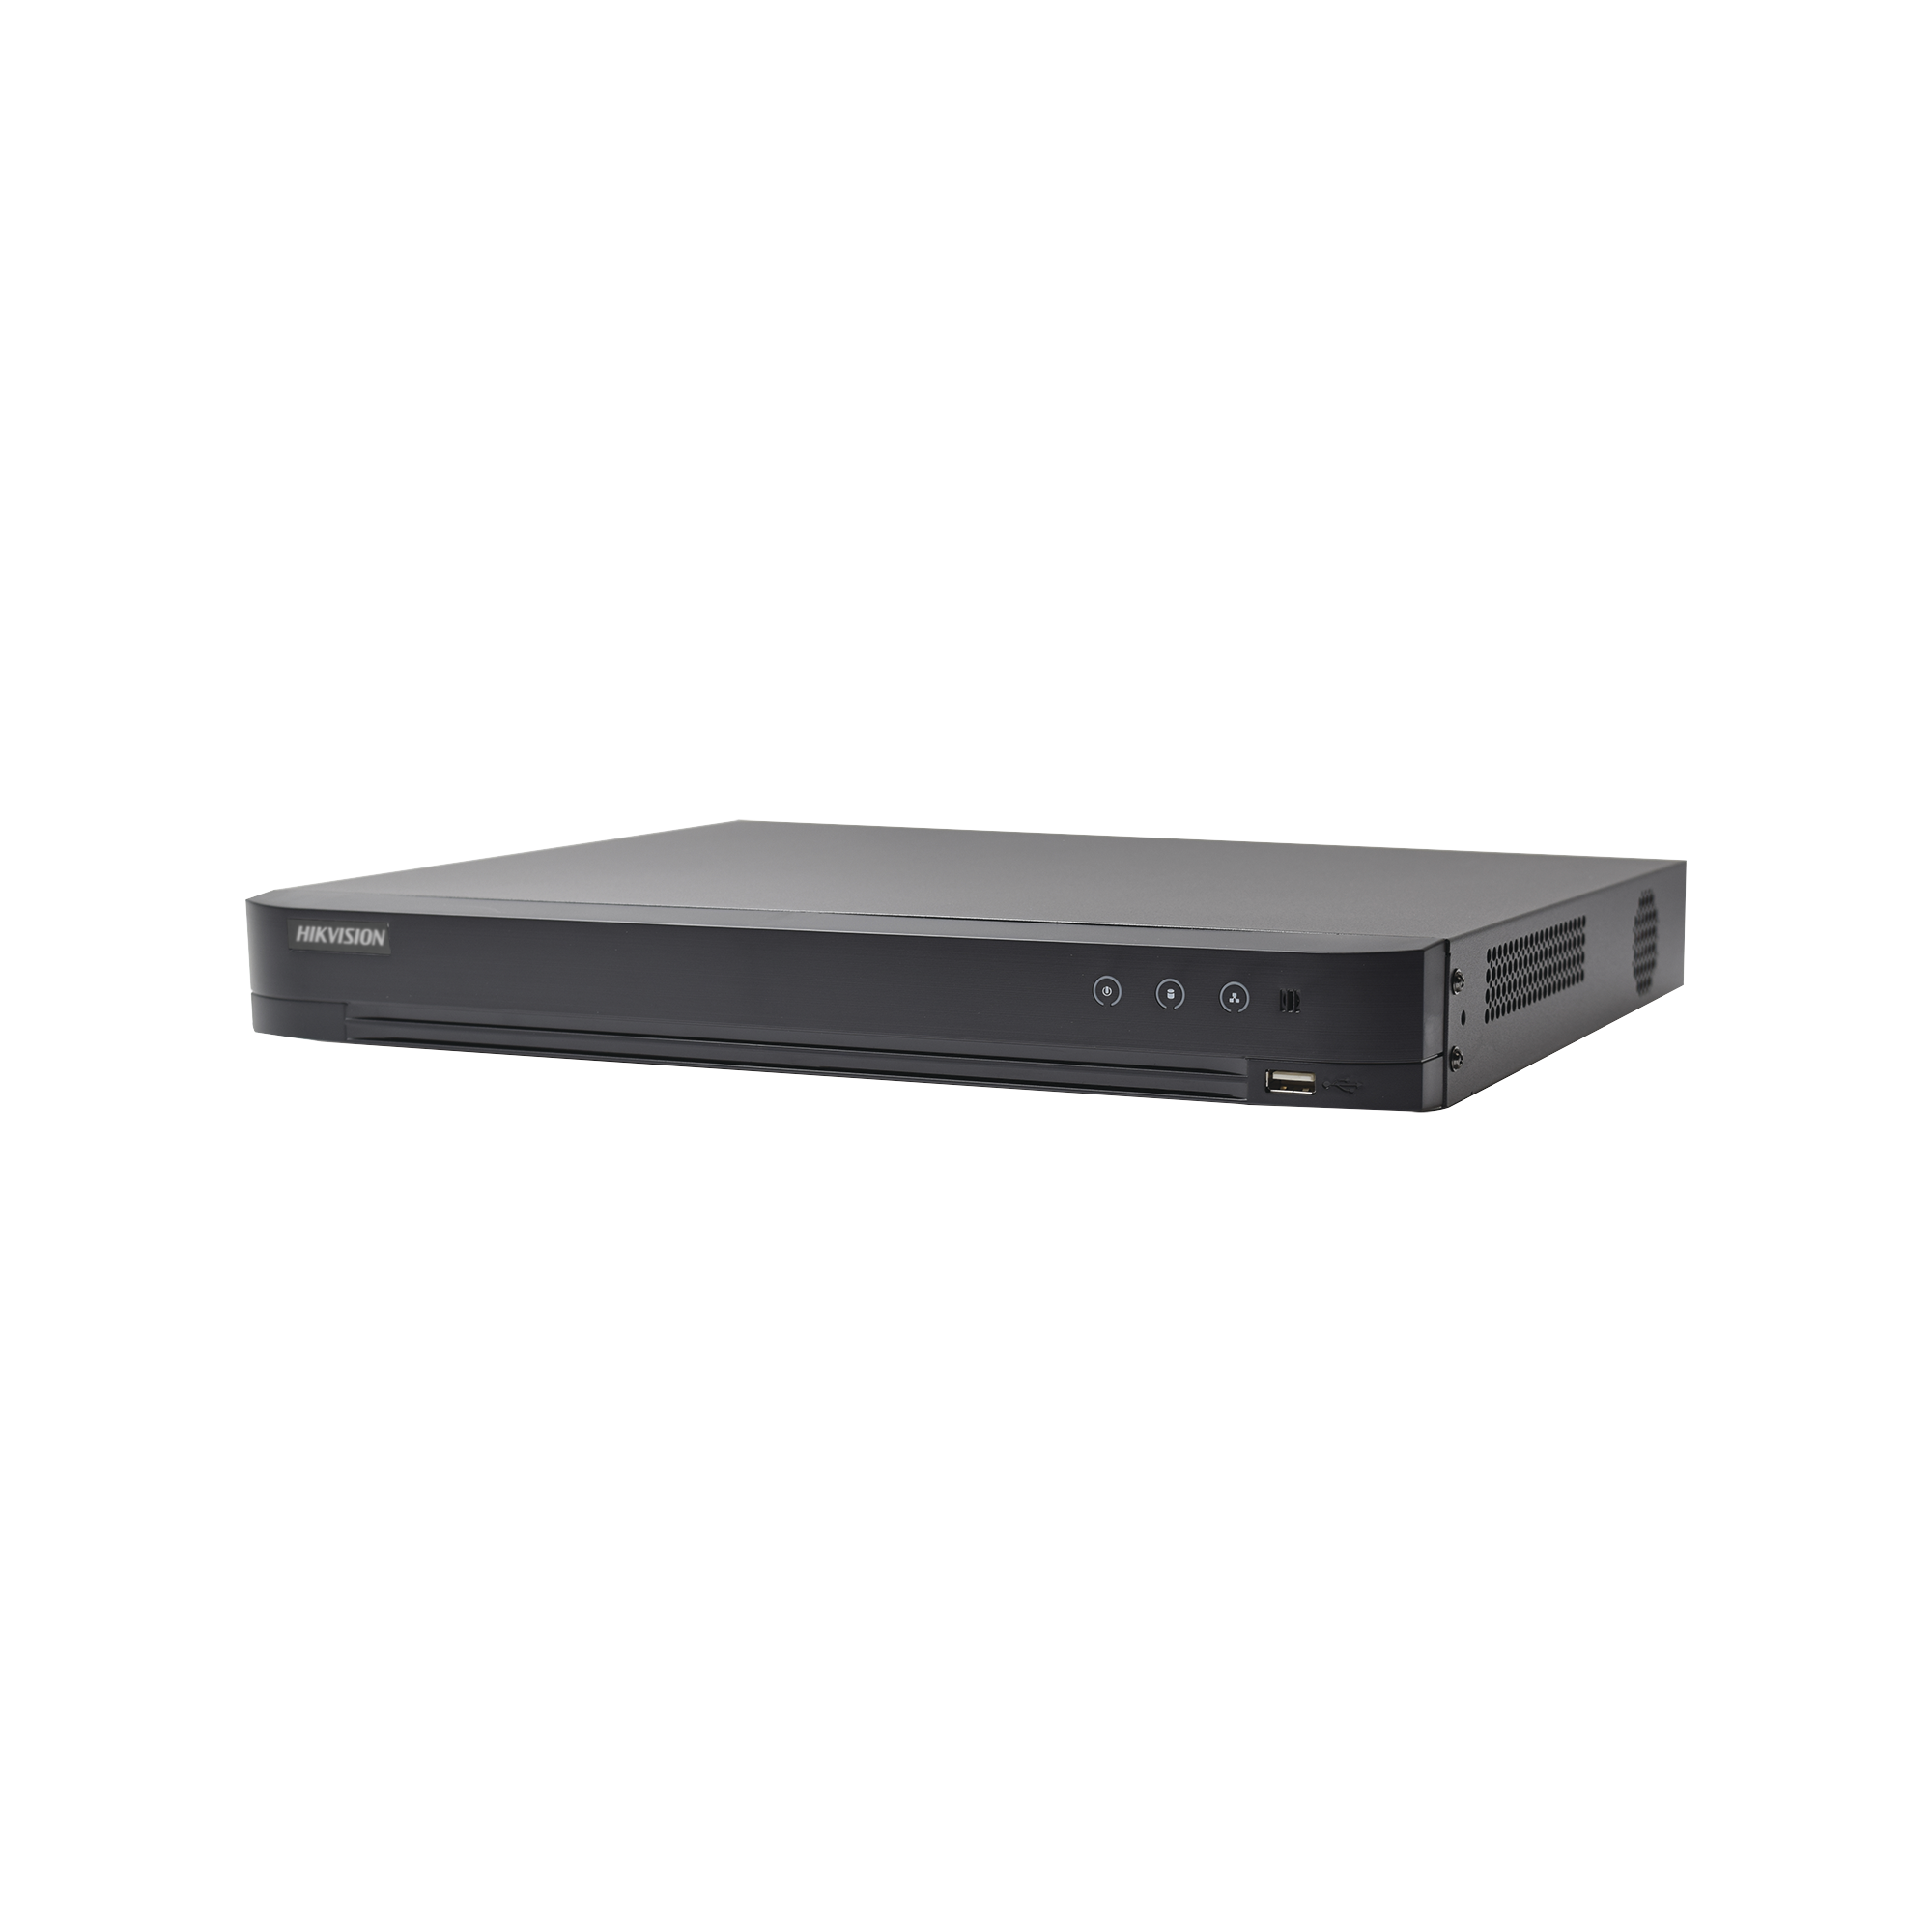 DVR 4 Megapixel / 32 Canales TURBOHD + 8 Canales IP / 2 Bahias de Disco Duro / 1 Canal de Audio / Videoanalisis